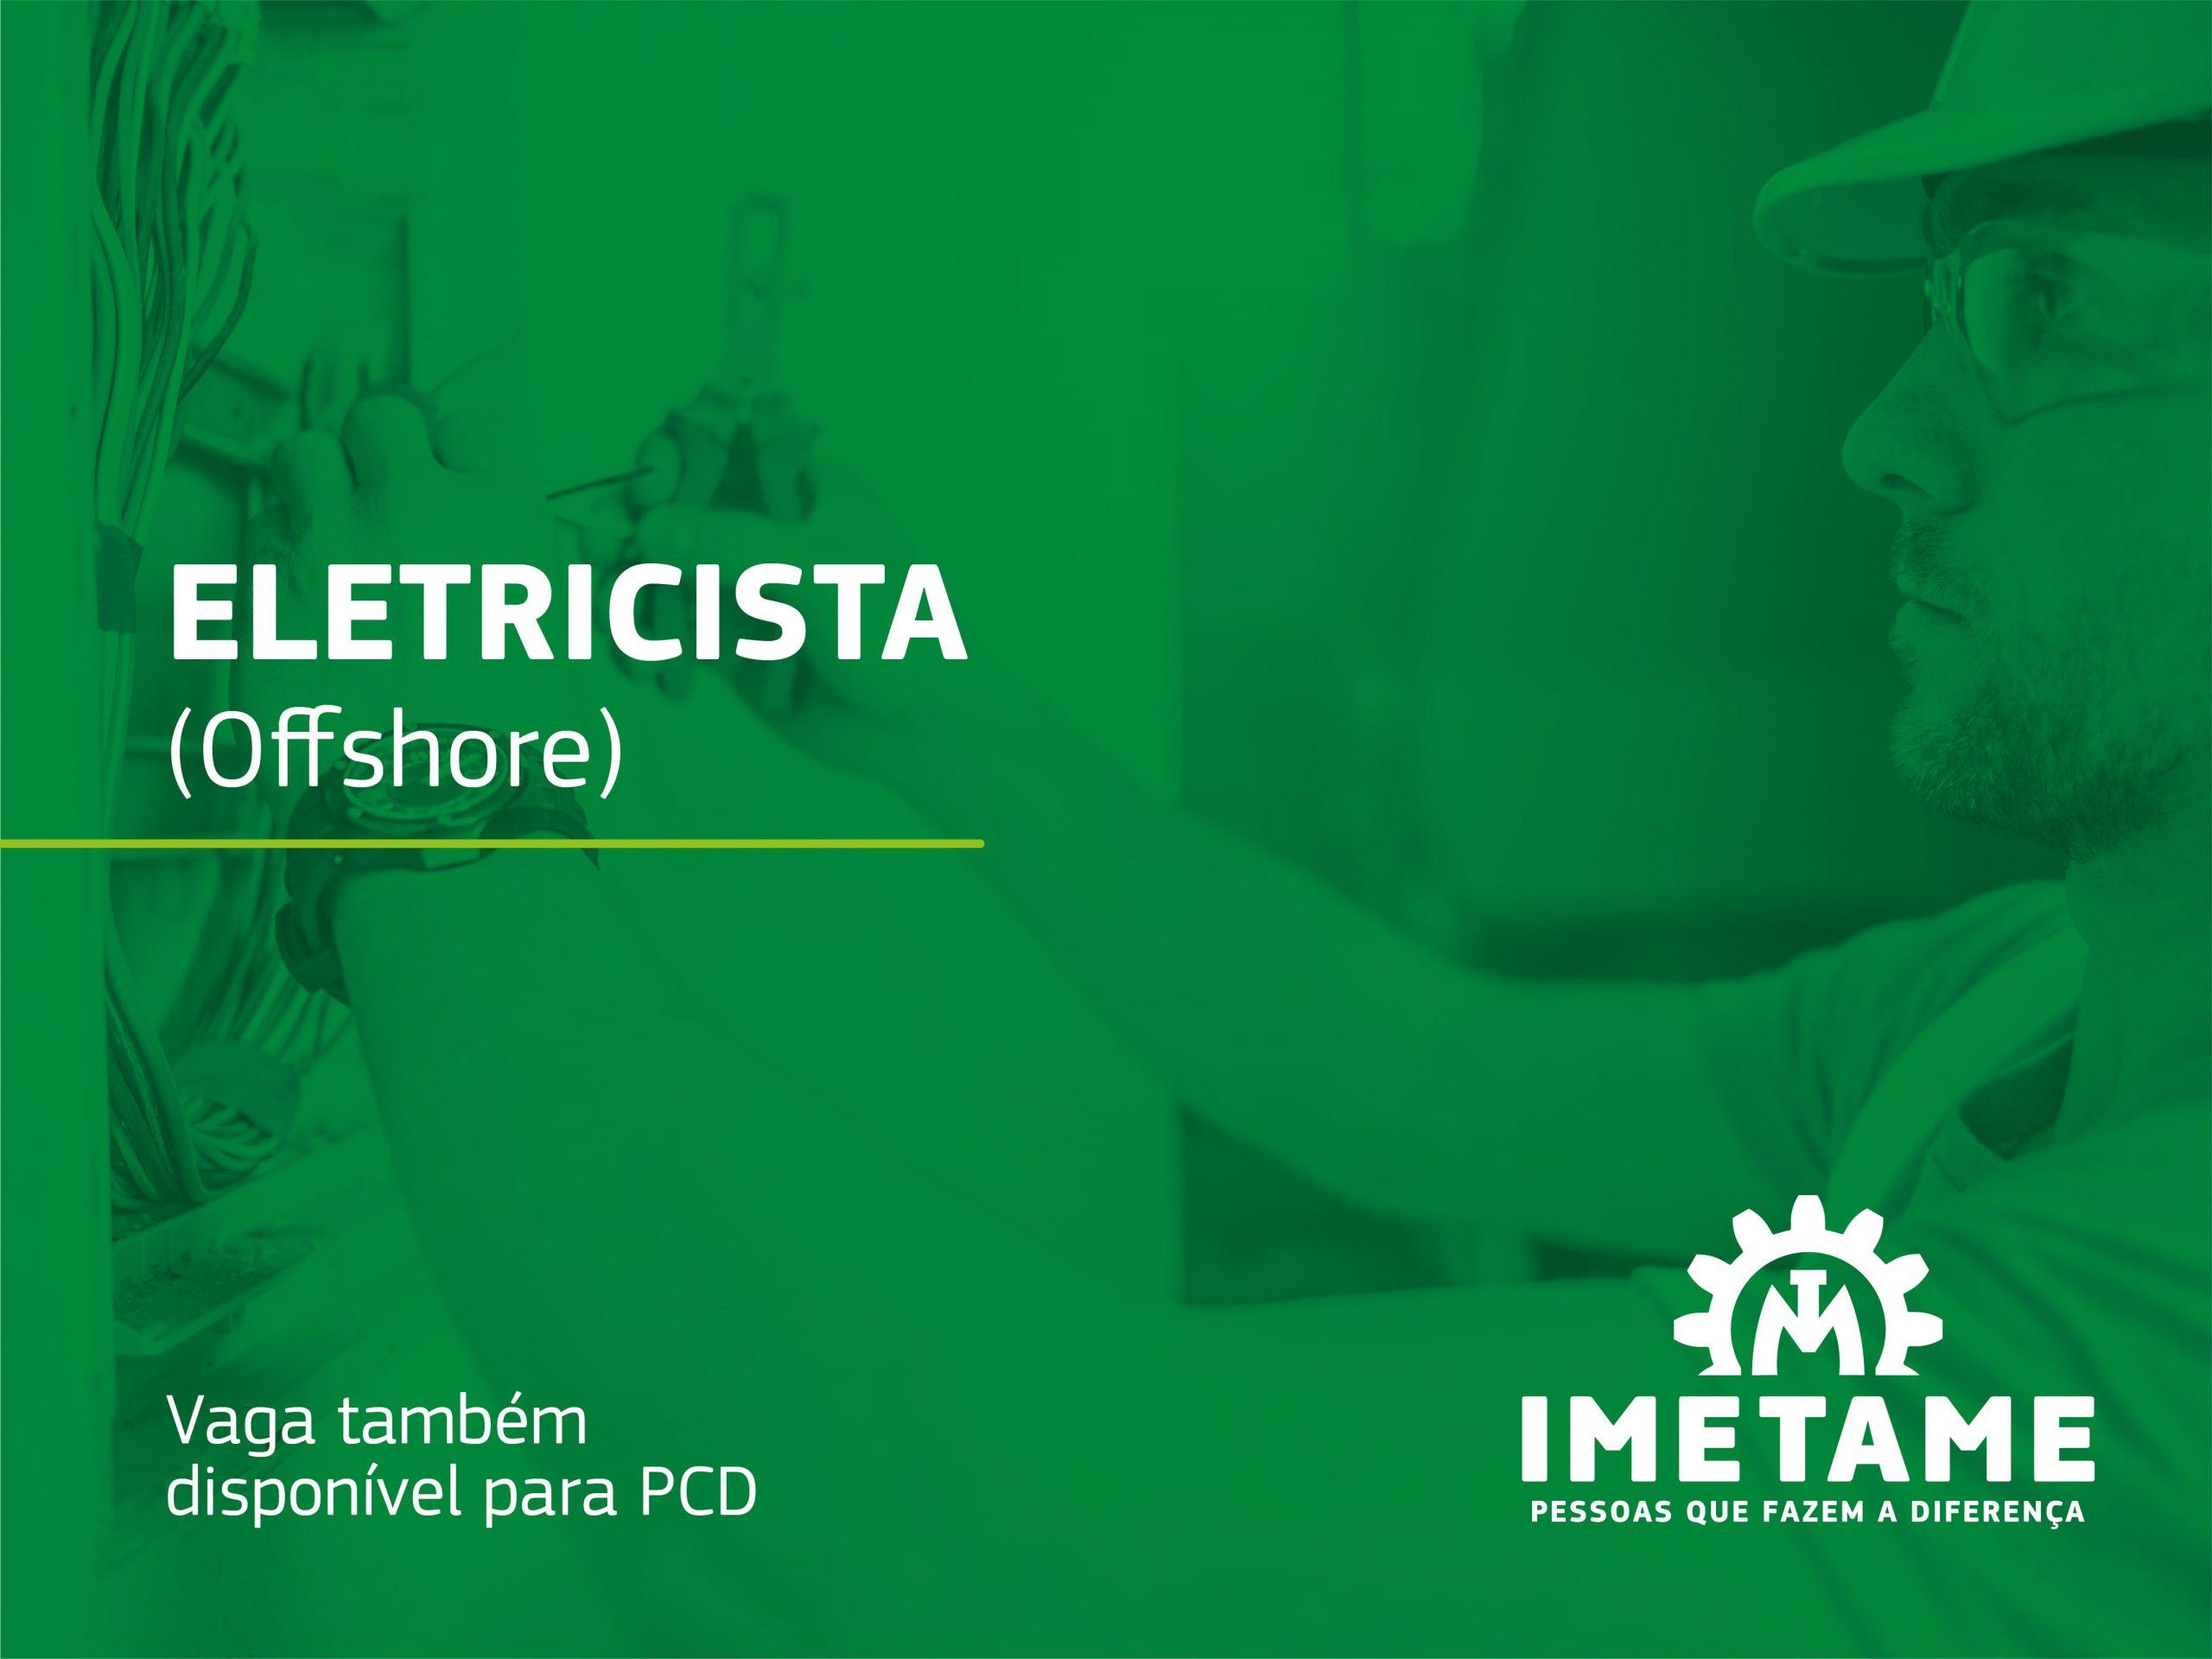 Eletricista – Offshore